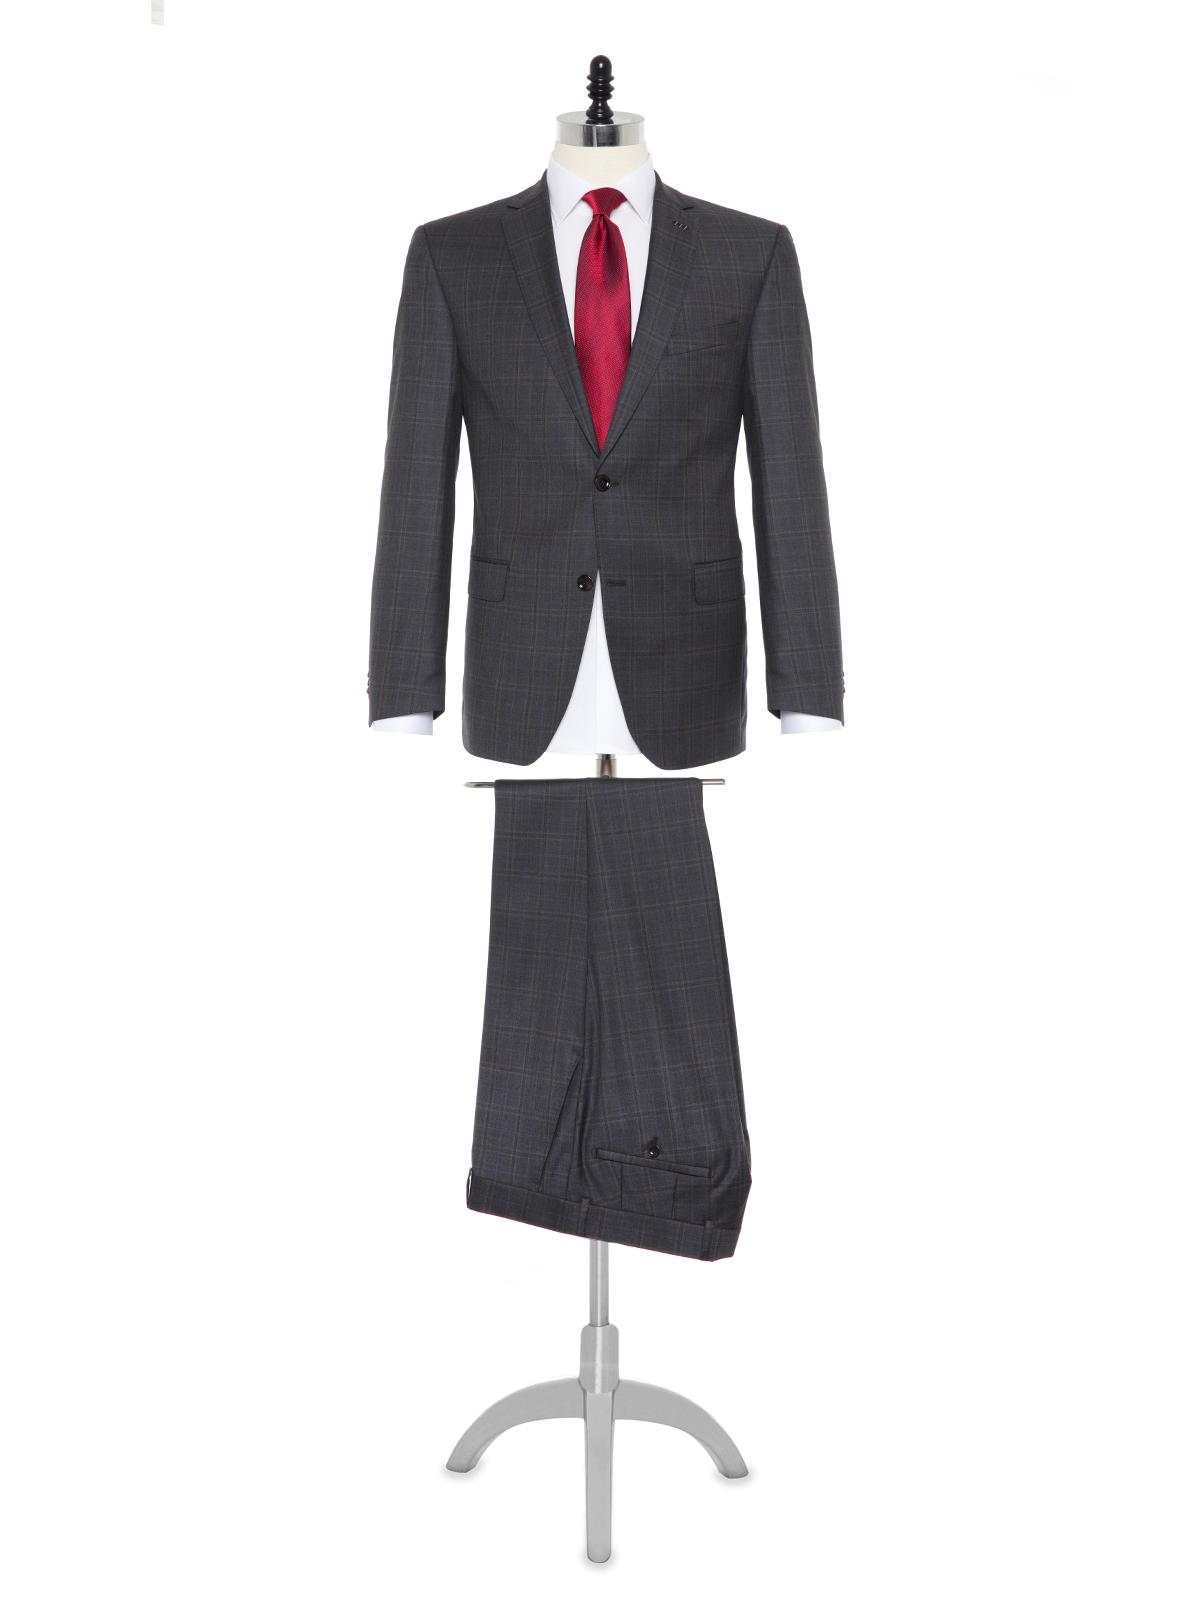 Carl Gross - Carl Gross Loro Piana Tasmanian Süper 150'S Gri Kareli Yün Takım Elbise